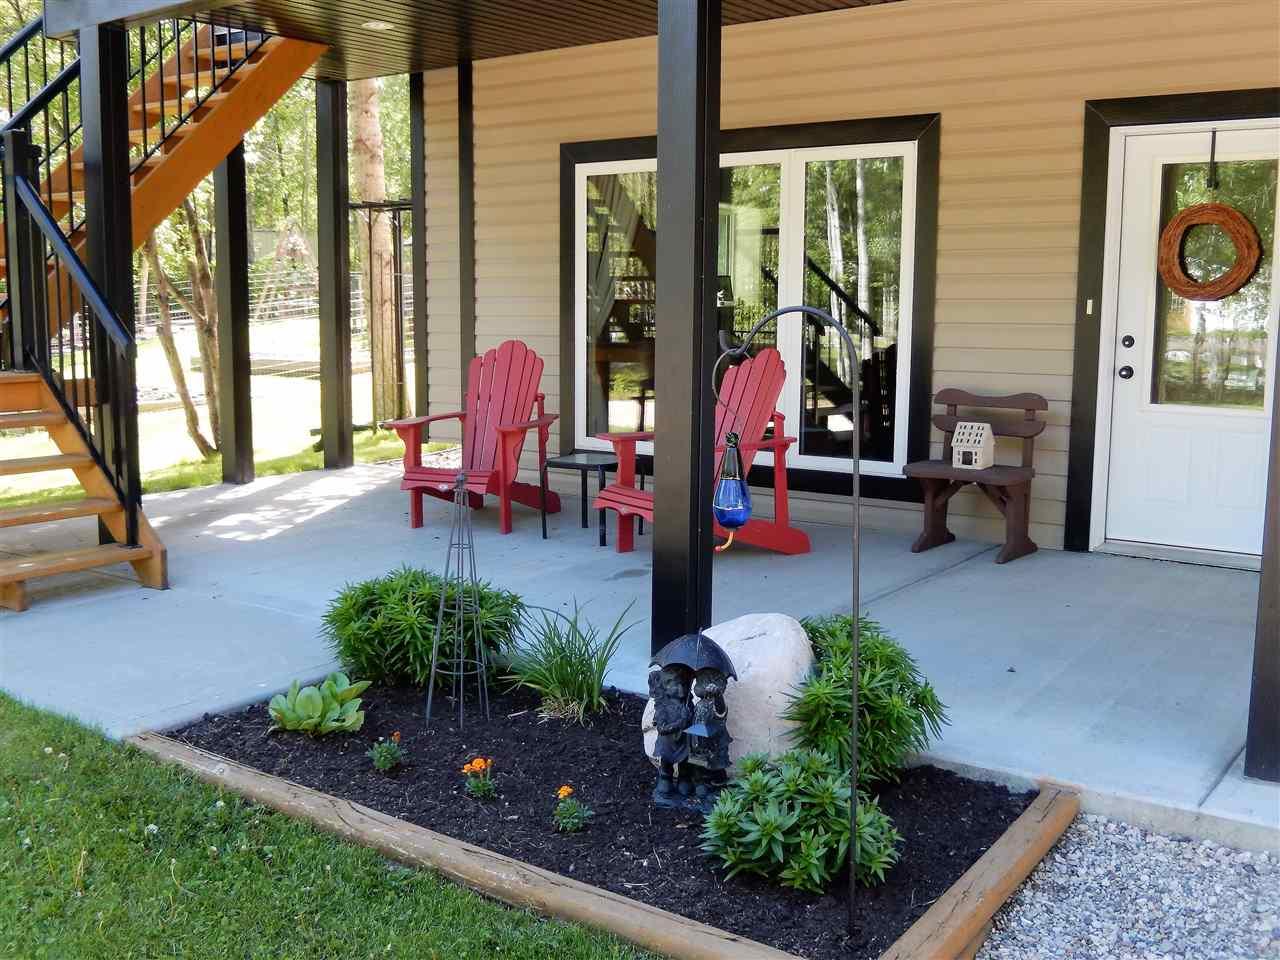 59 & 61 4224 Twp 545, Rural Lac Ste. Anne County, MLS® # E4161905